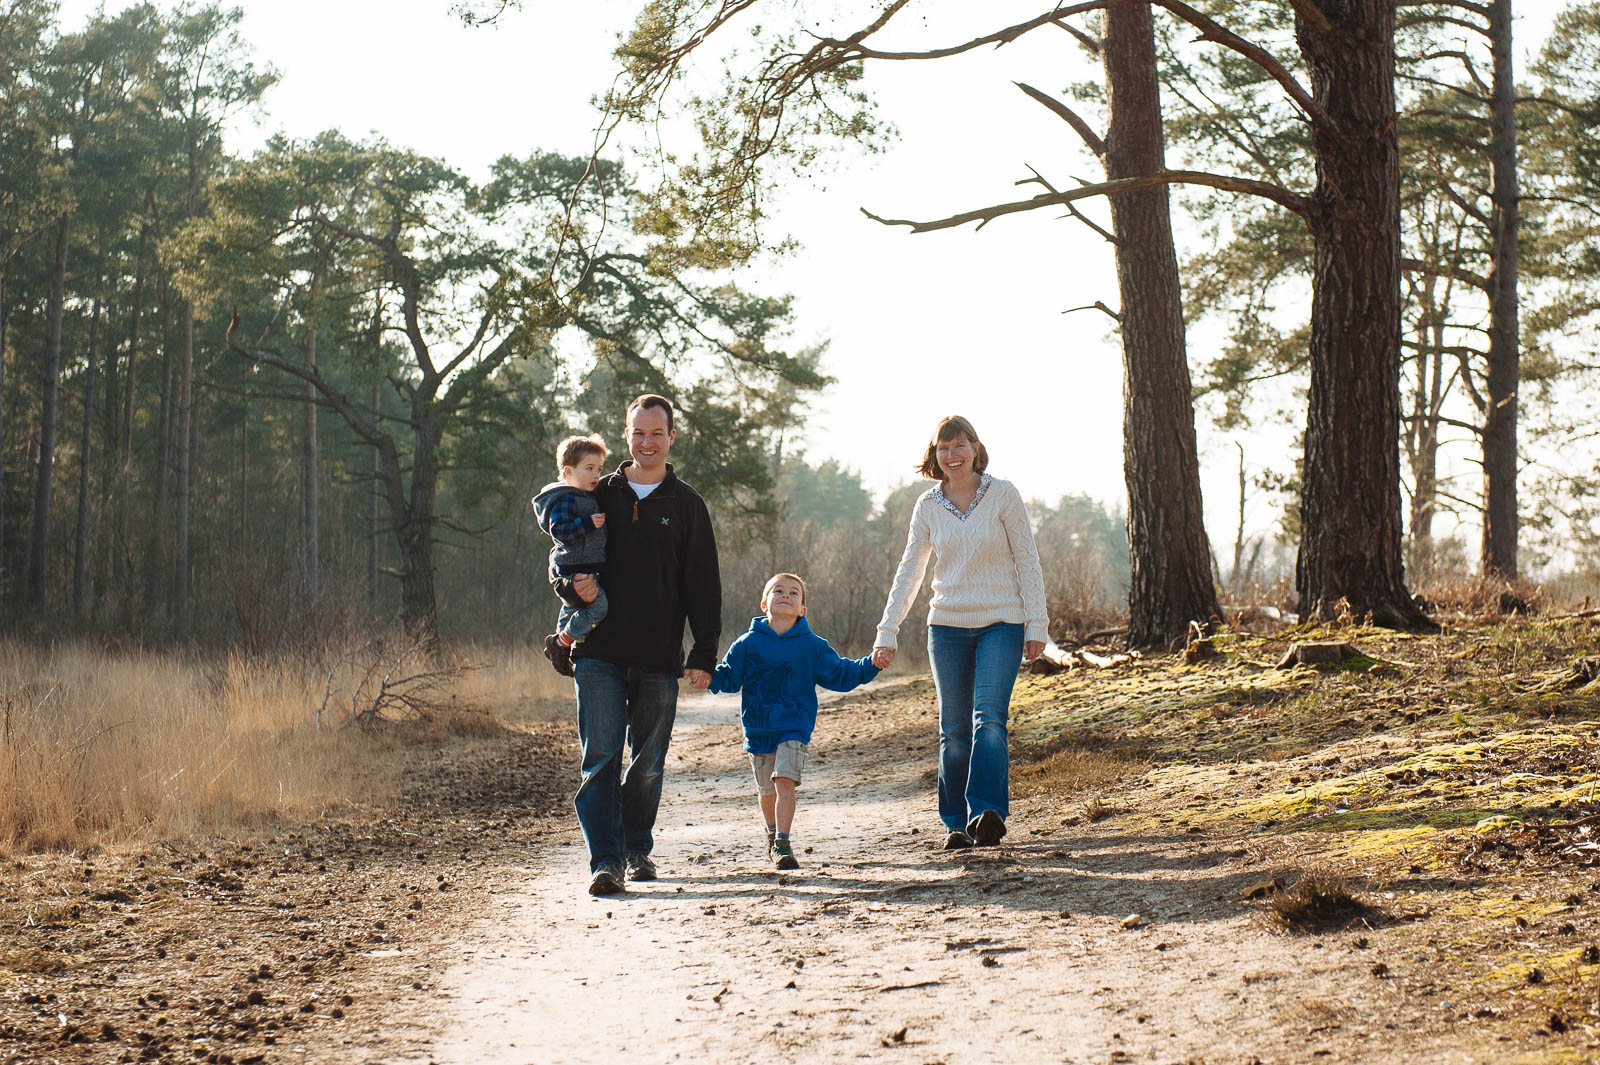 Pulborough-family-photographer-009